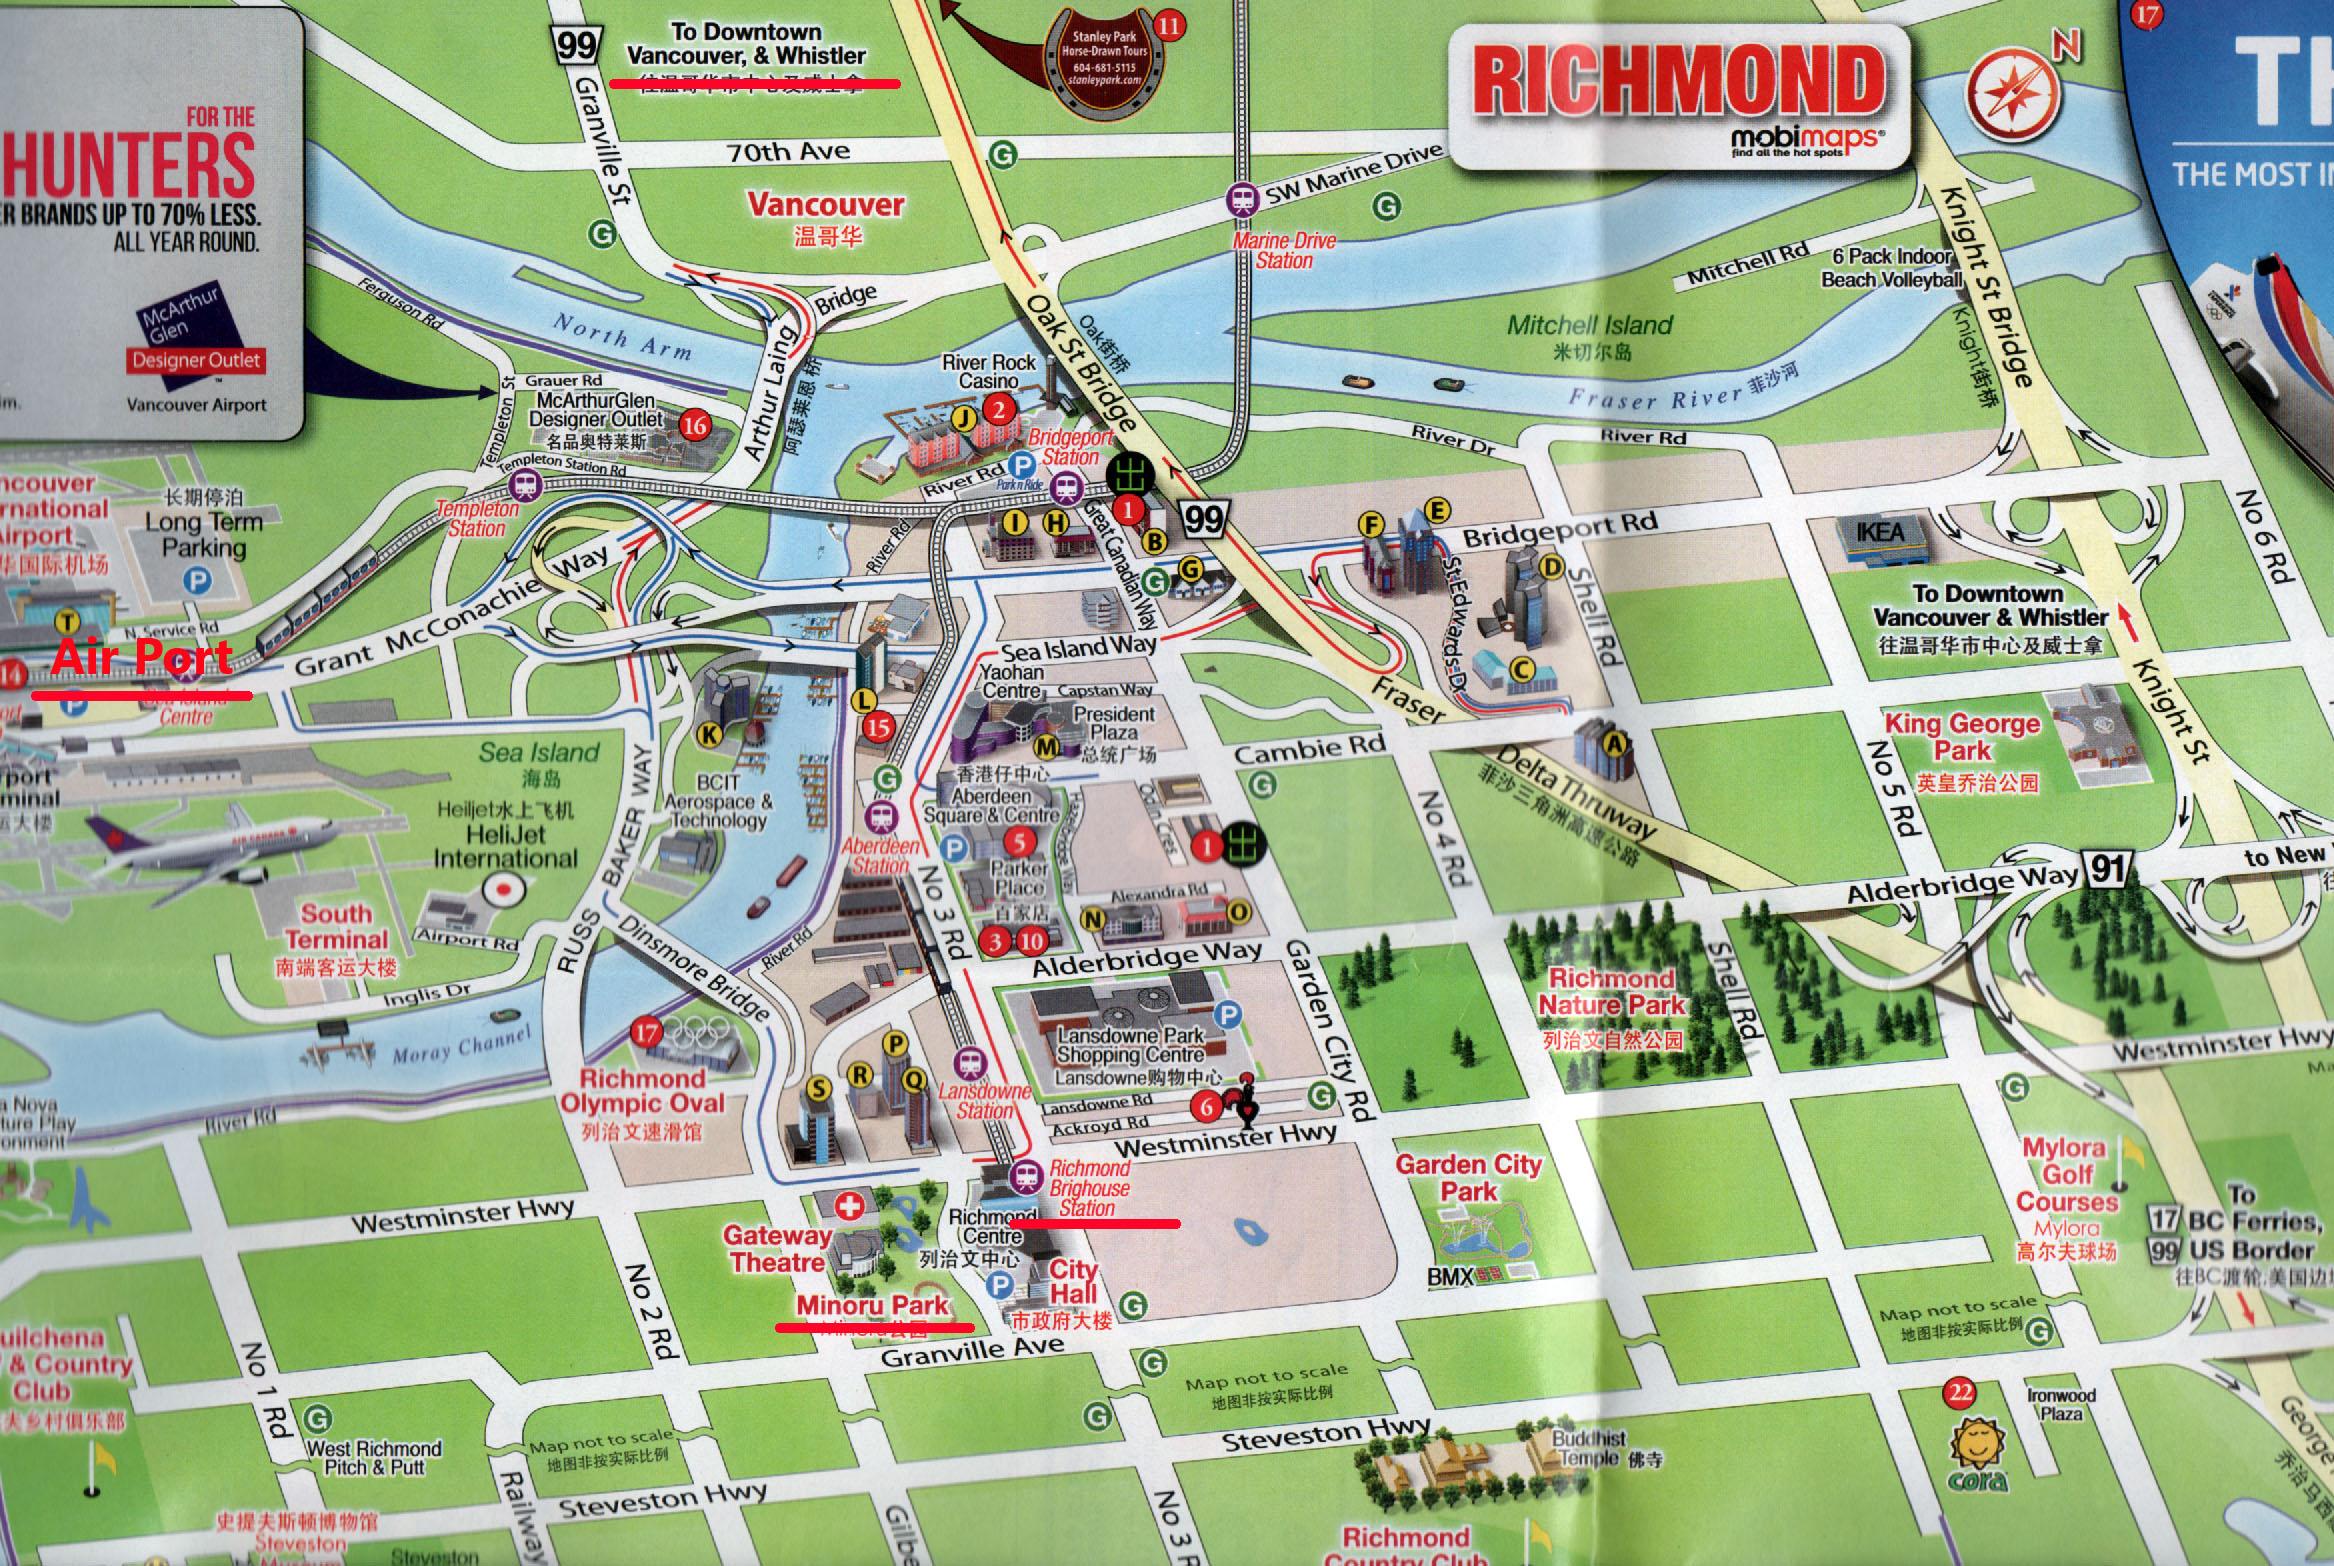 03_richimond_map02.jpg